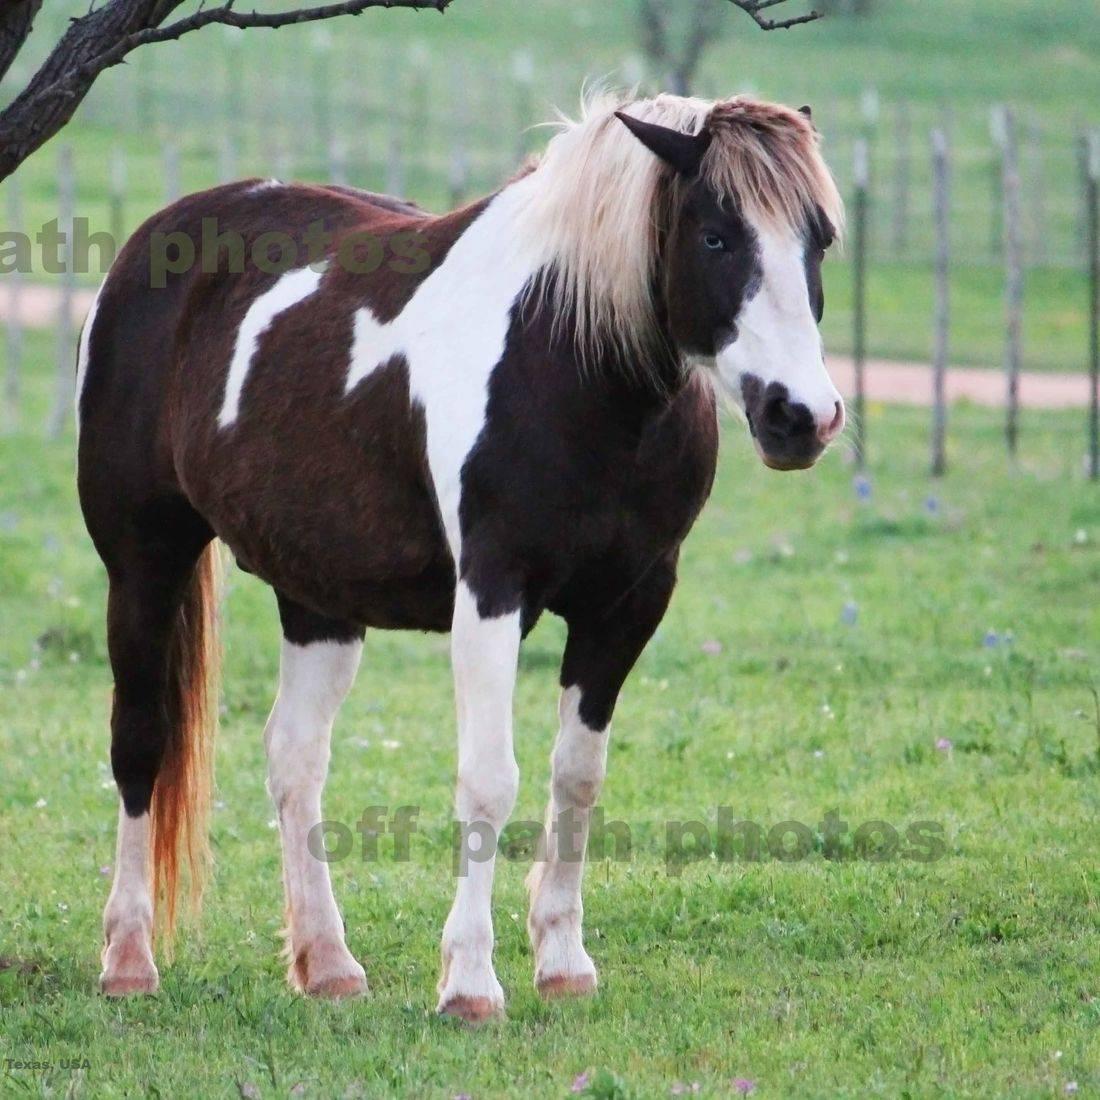 photography, animals, farm, country, pinto horses, pasture, grumpy, bad day